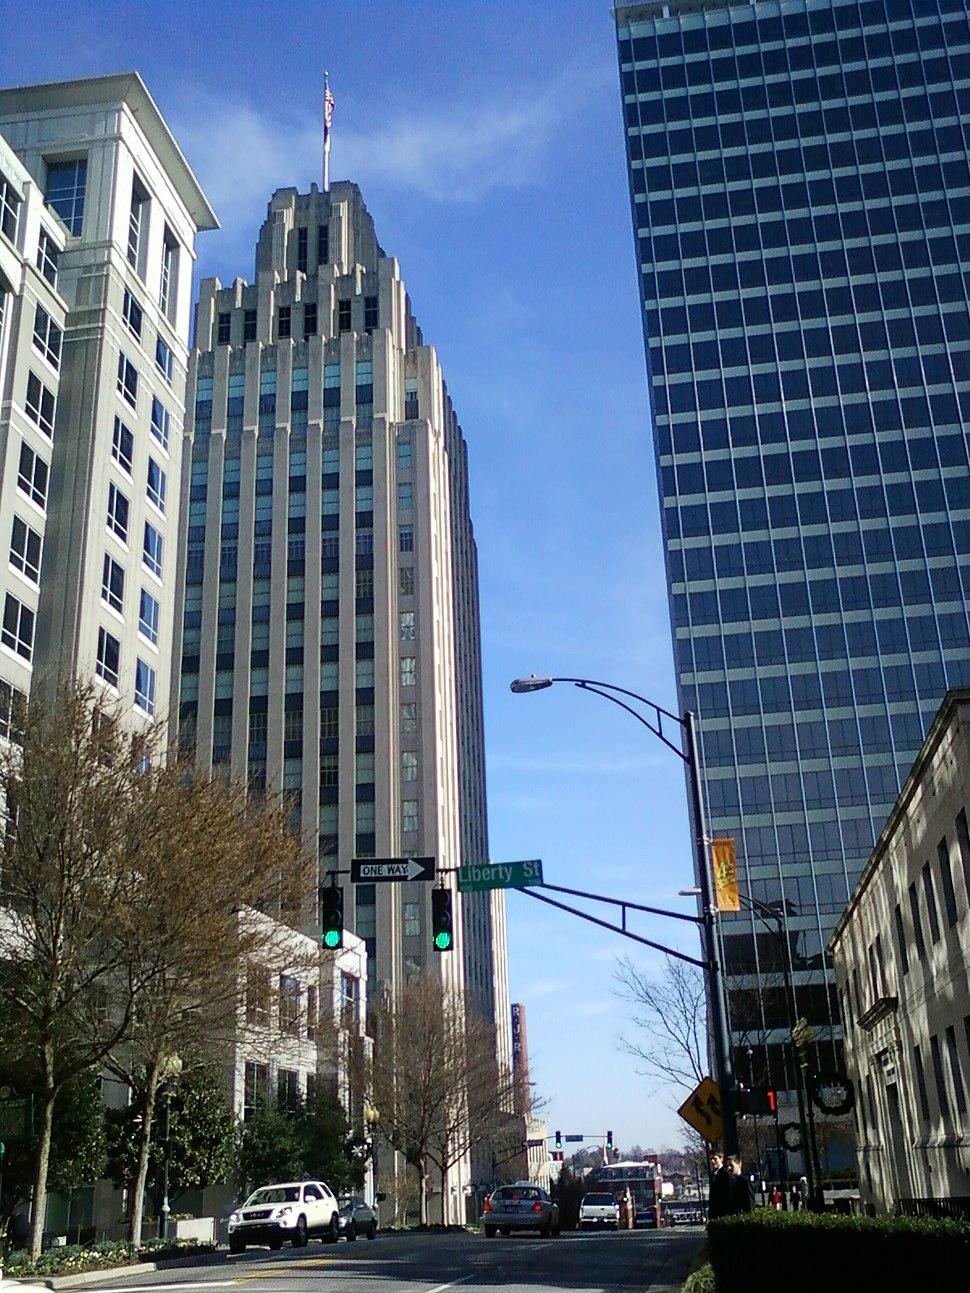 Reynolds Building street view